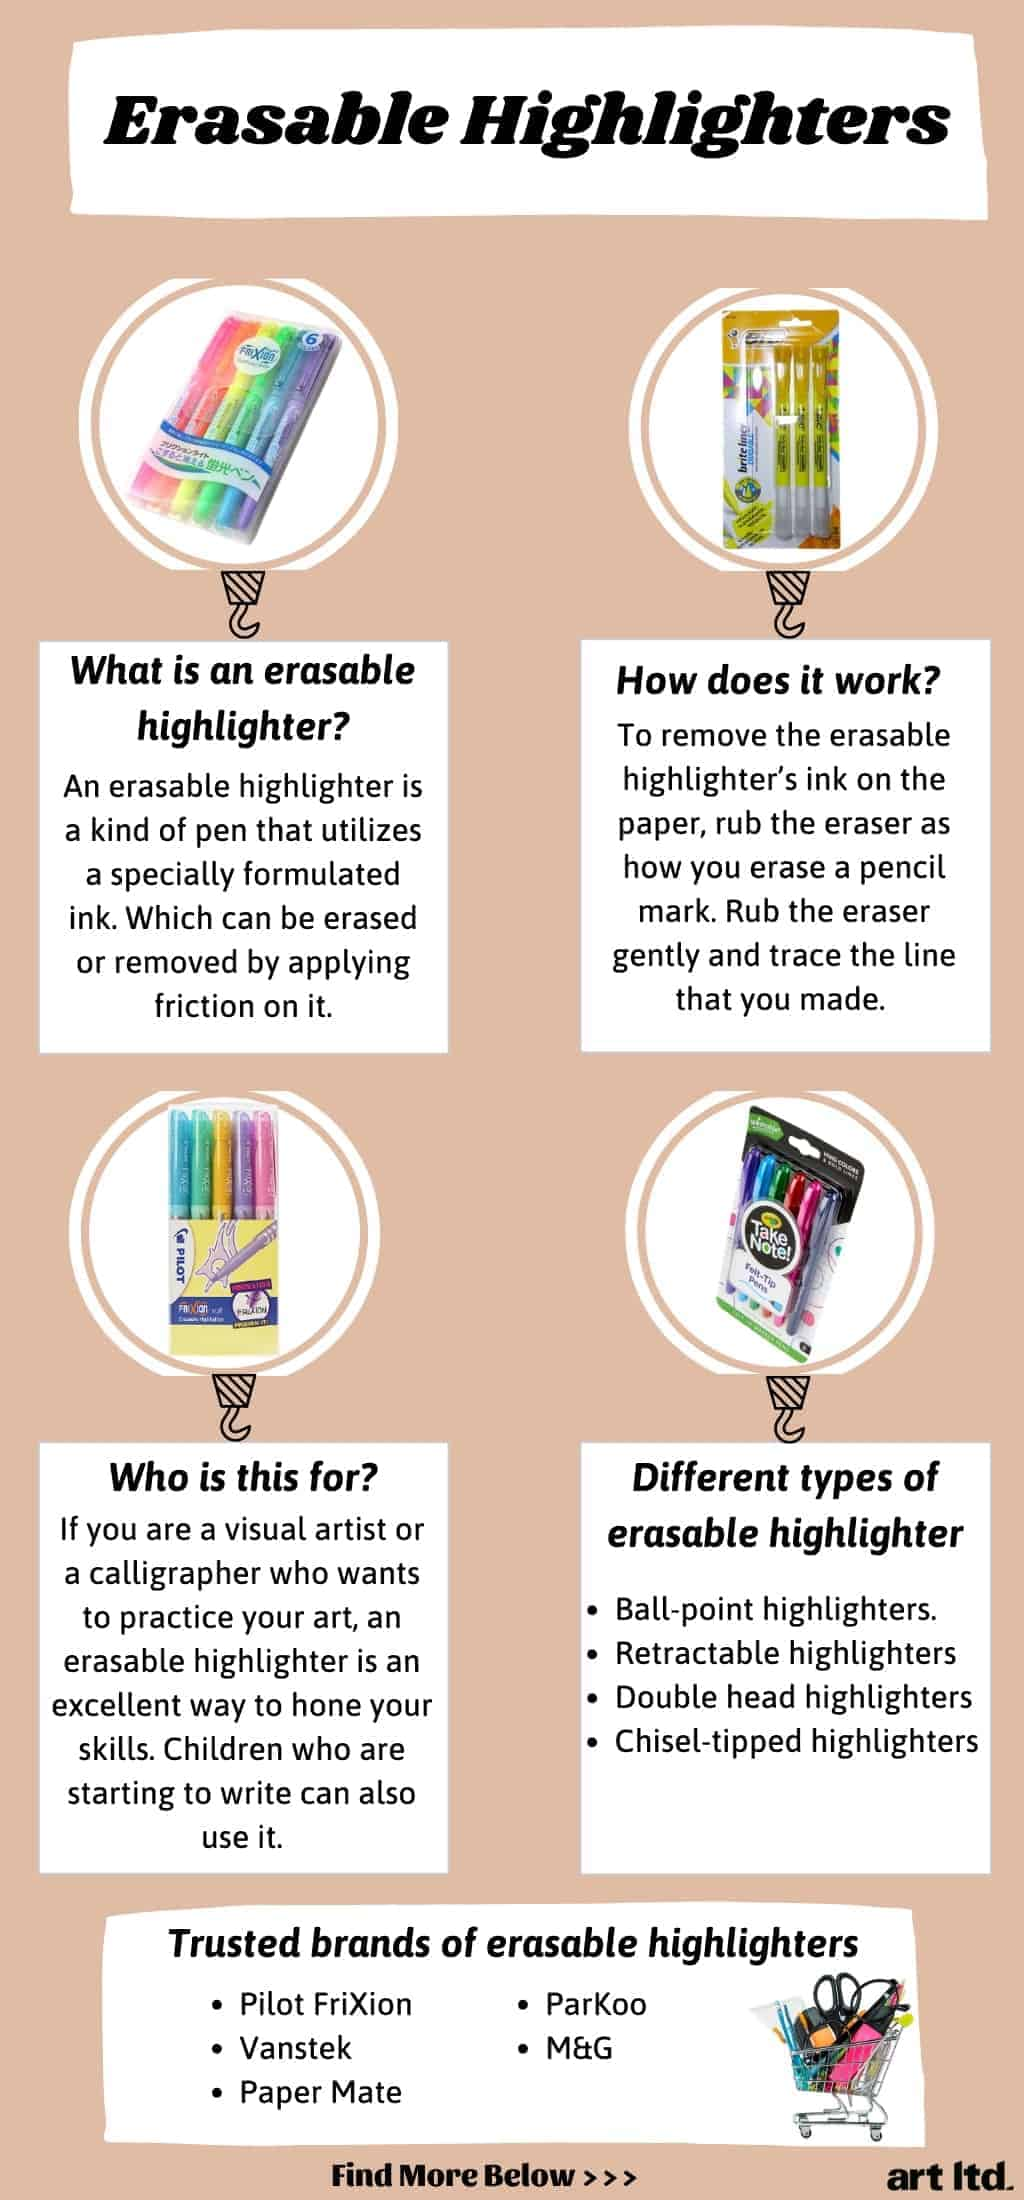 crayola-erasable-highlighters